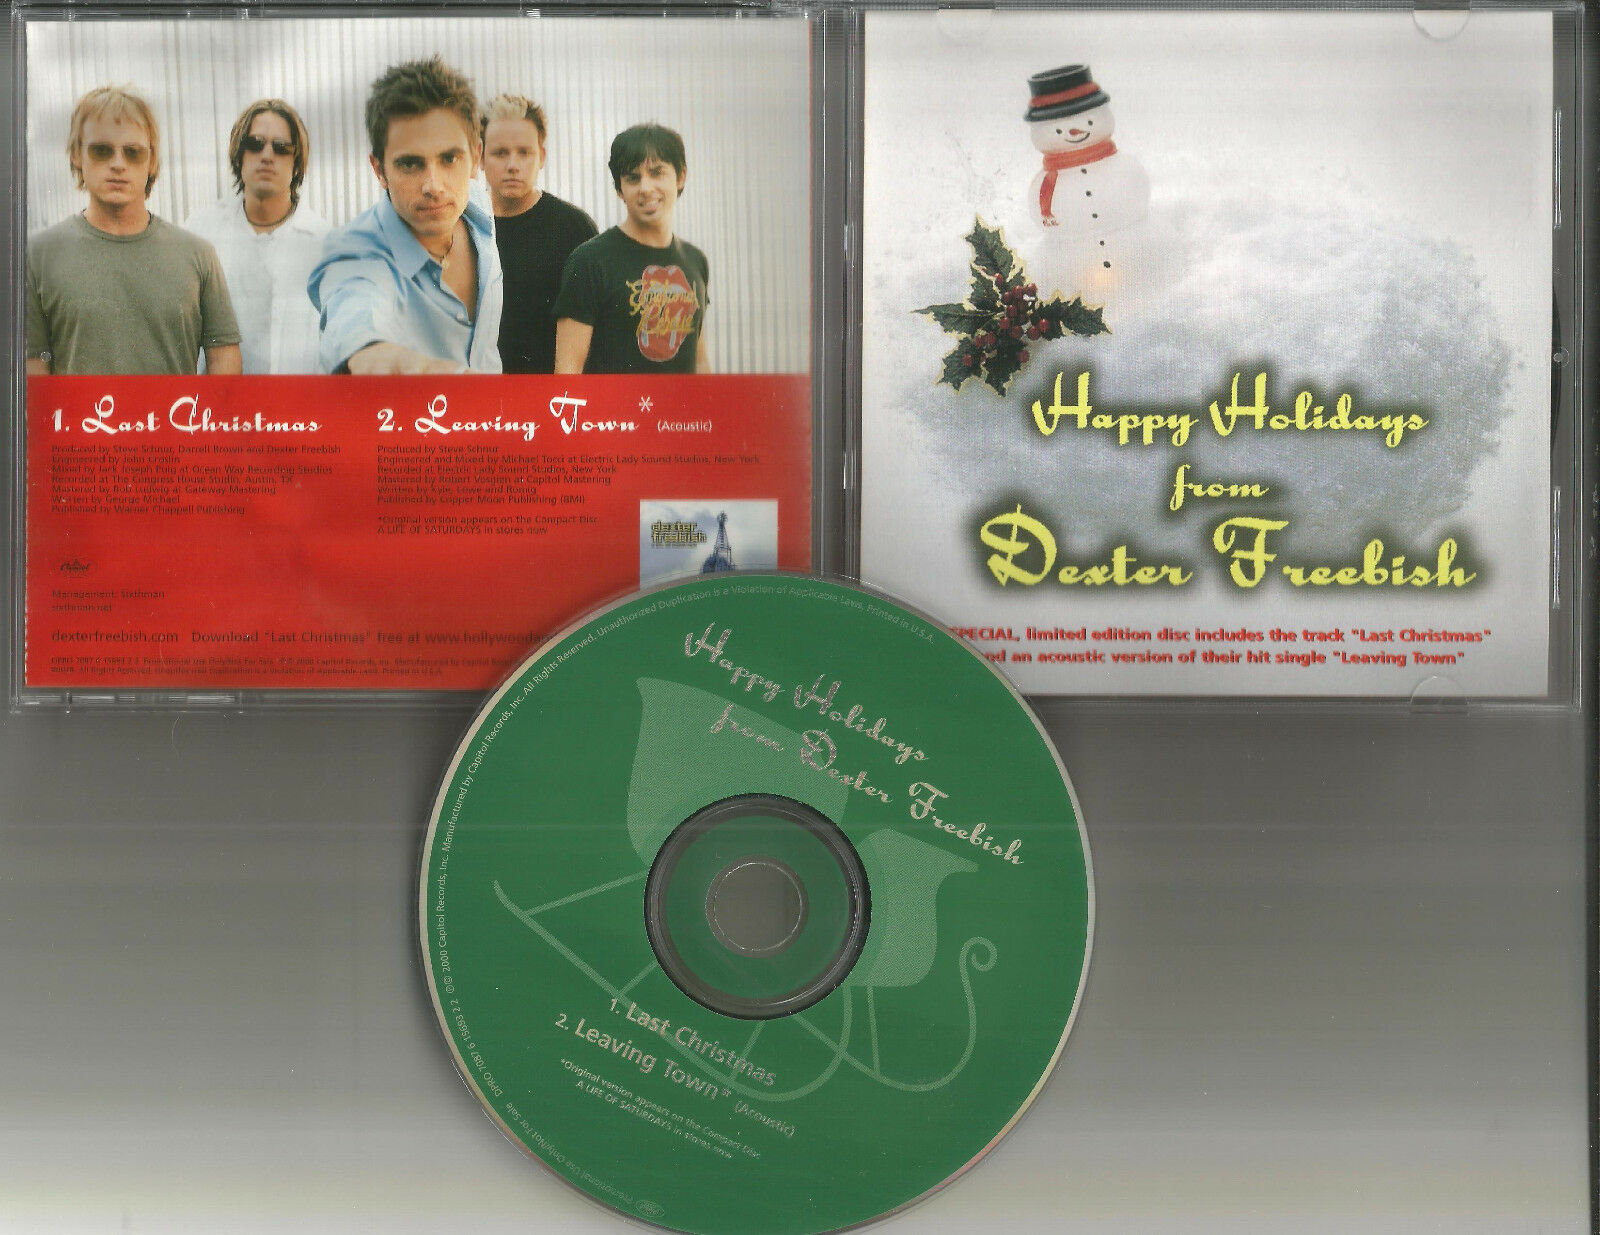 dexter freebish last christmas xmas acoustic promo dj cd single wham trk ebay - Last Christmas Original